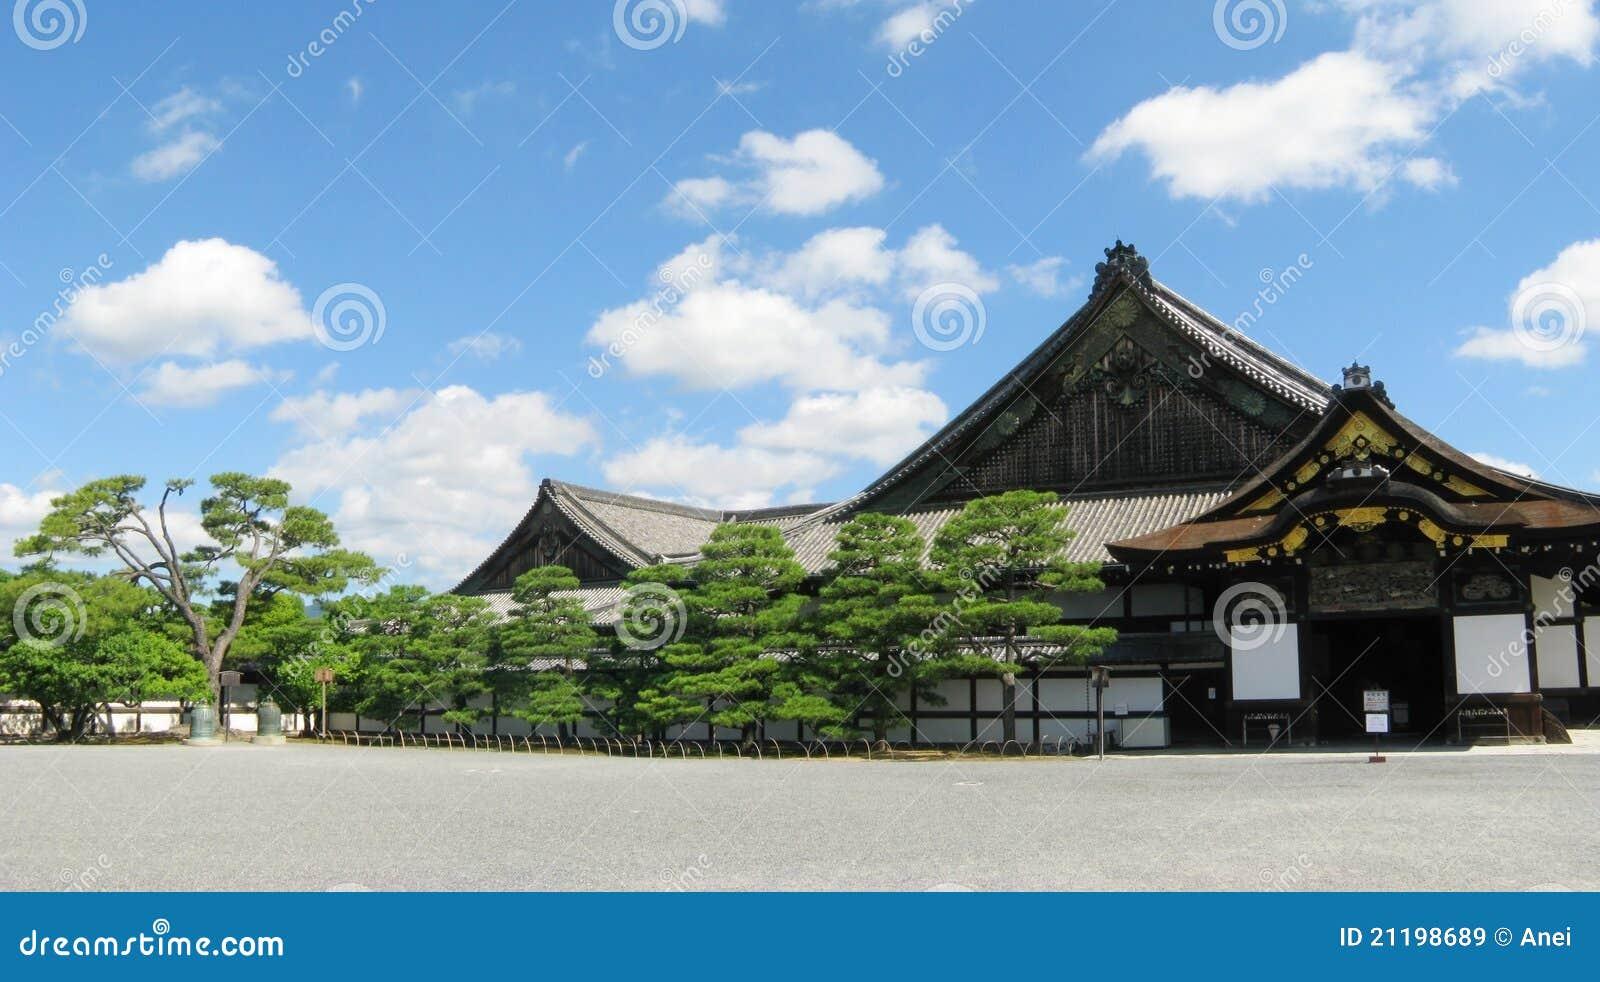 Kyoto Nijo castle buildings